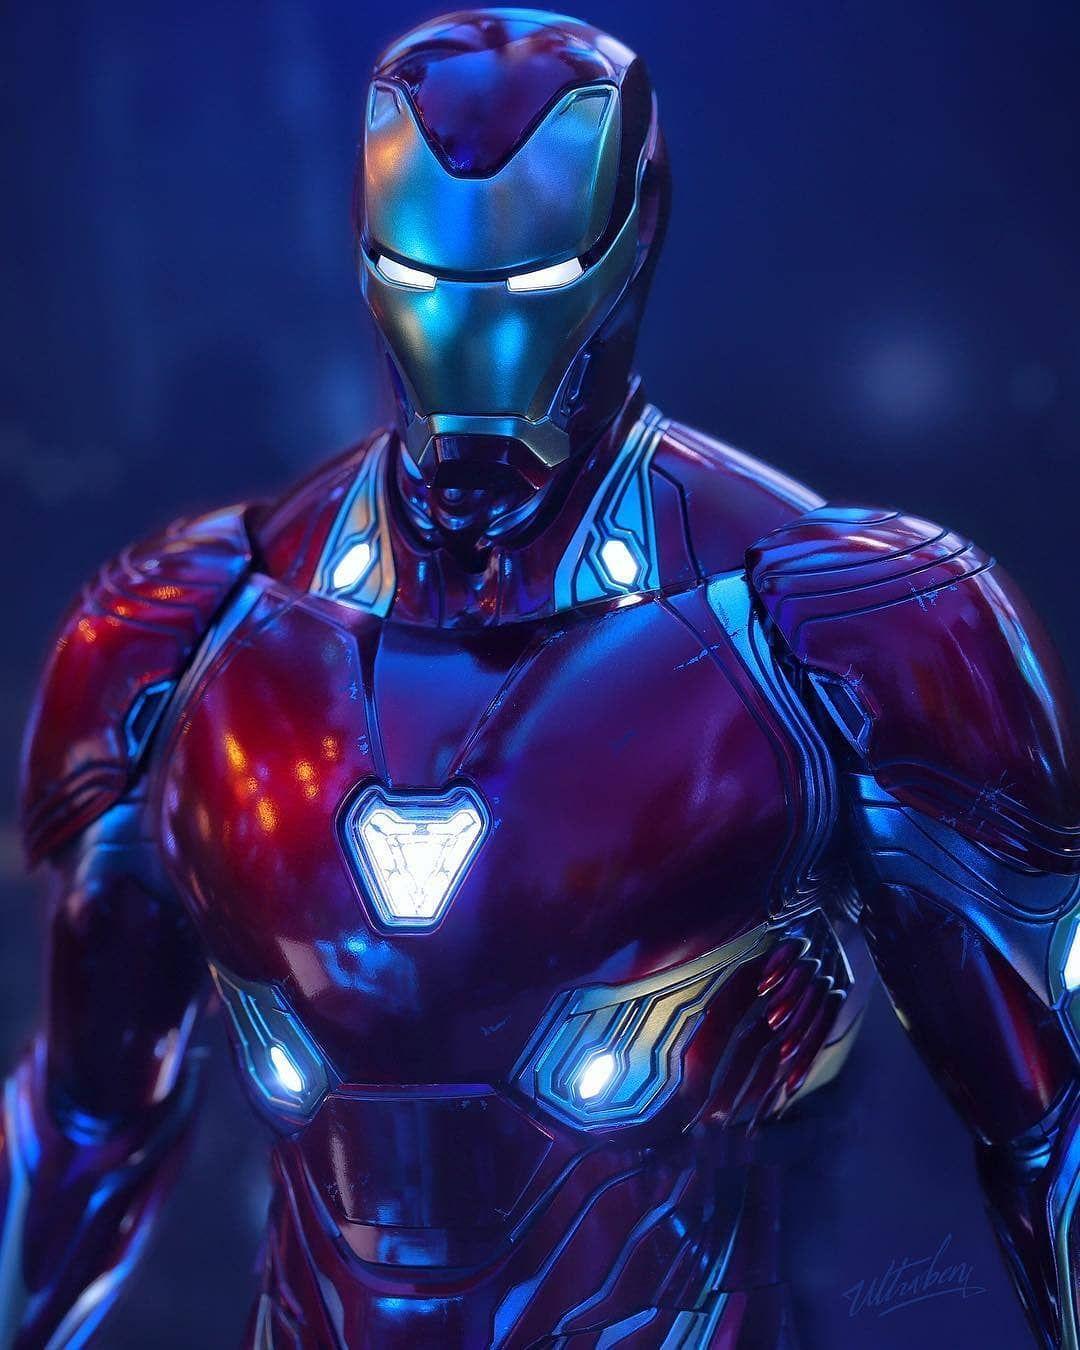 This Shot Looks So Cool By Ultraben235 Follow Marveldaily270 Marveld Marvel Iron Man Iron Man Wallpaper Iron Man